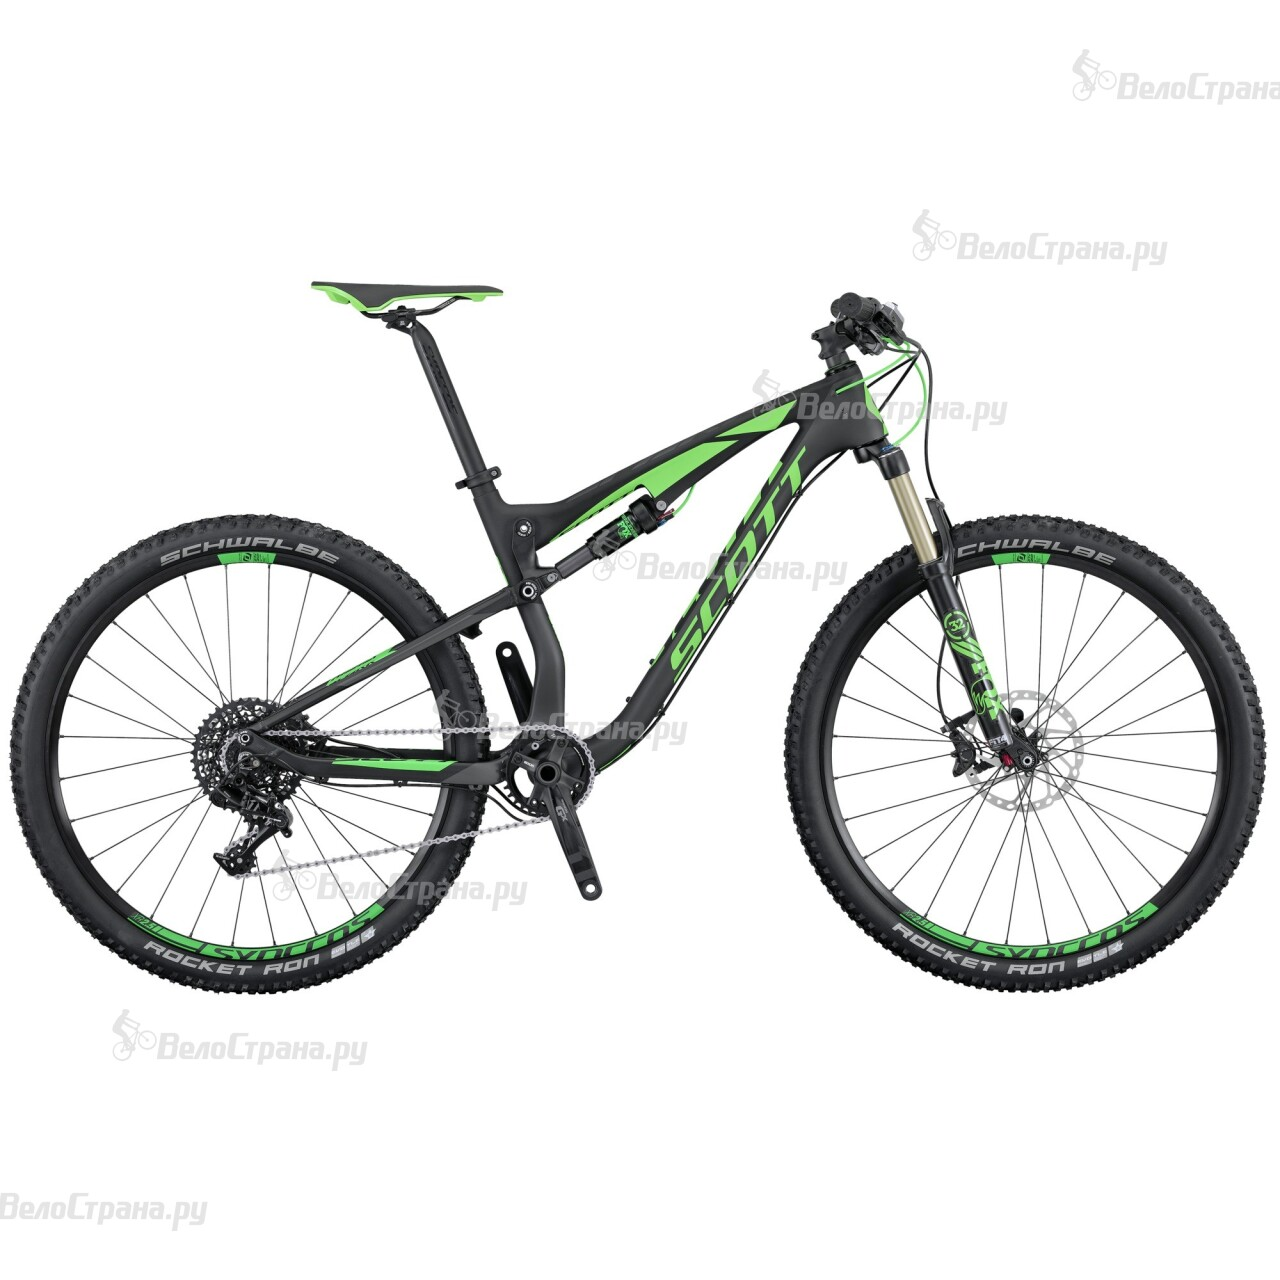 Велосипед Scott Spark 720 (2016) телефон wileyfox spark